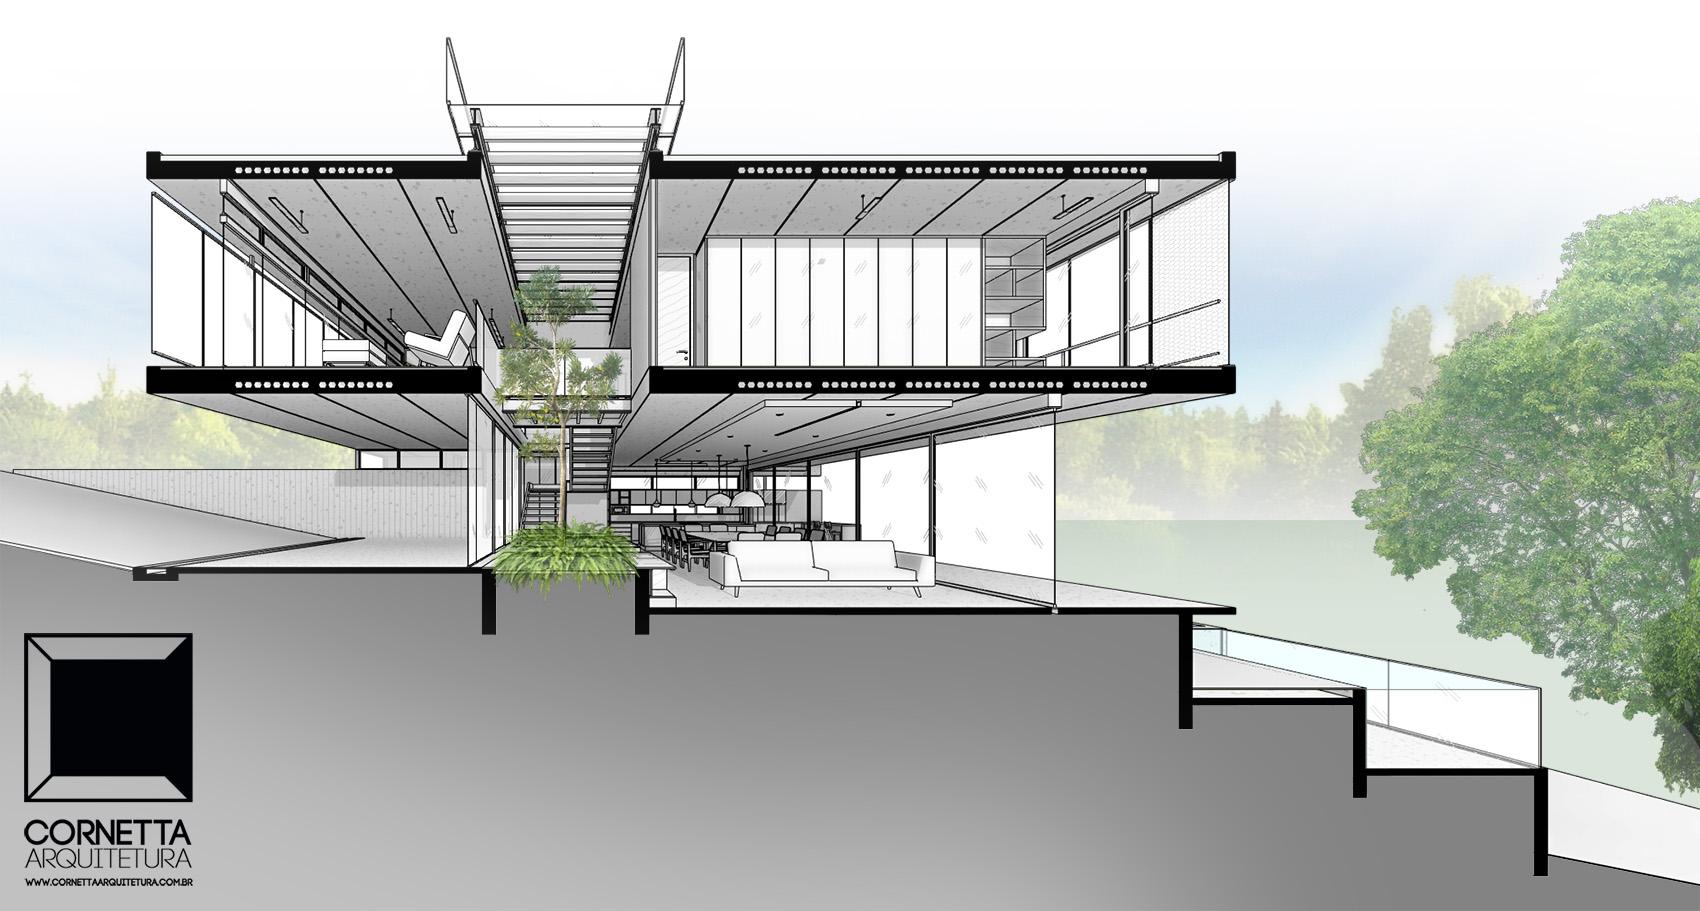 Casa 22 casa minimalista constru o industrializada for Casa minimalista dwg